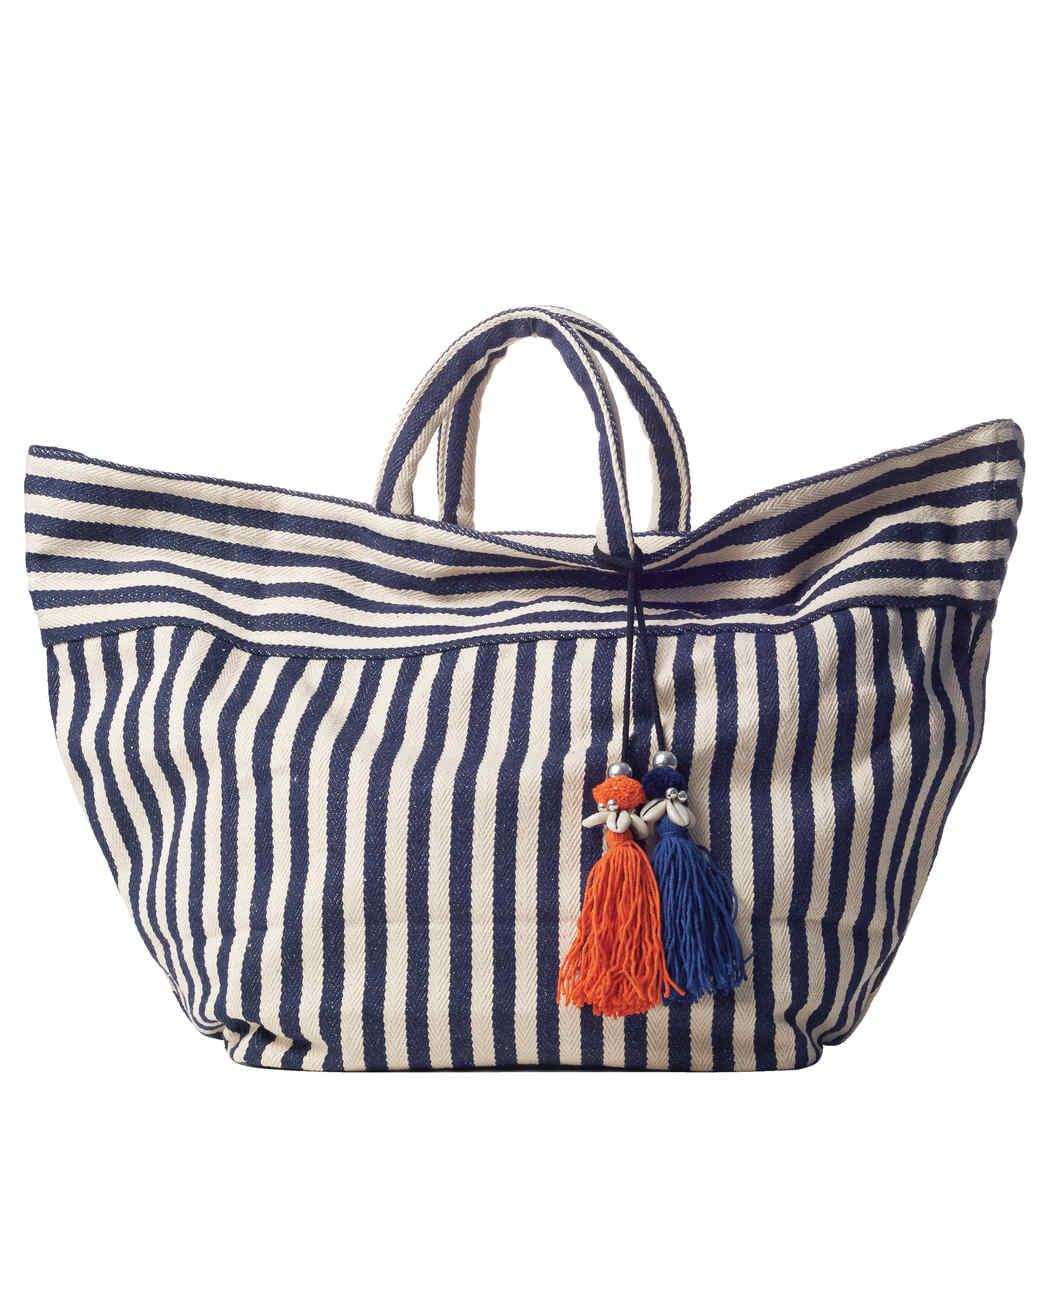 navy-cotton-stripe-bag-061-d112186.jpg